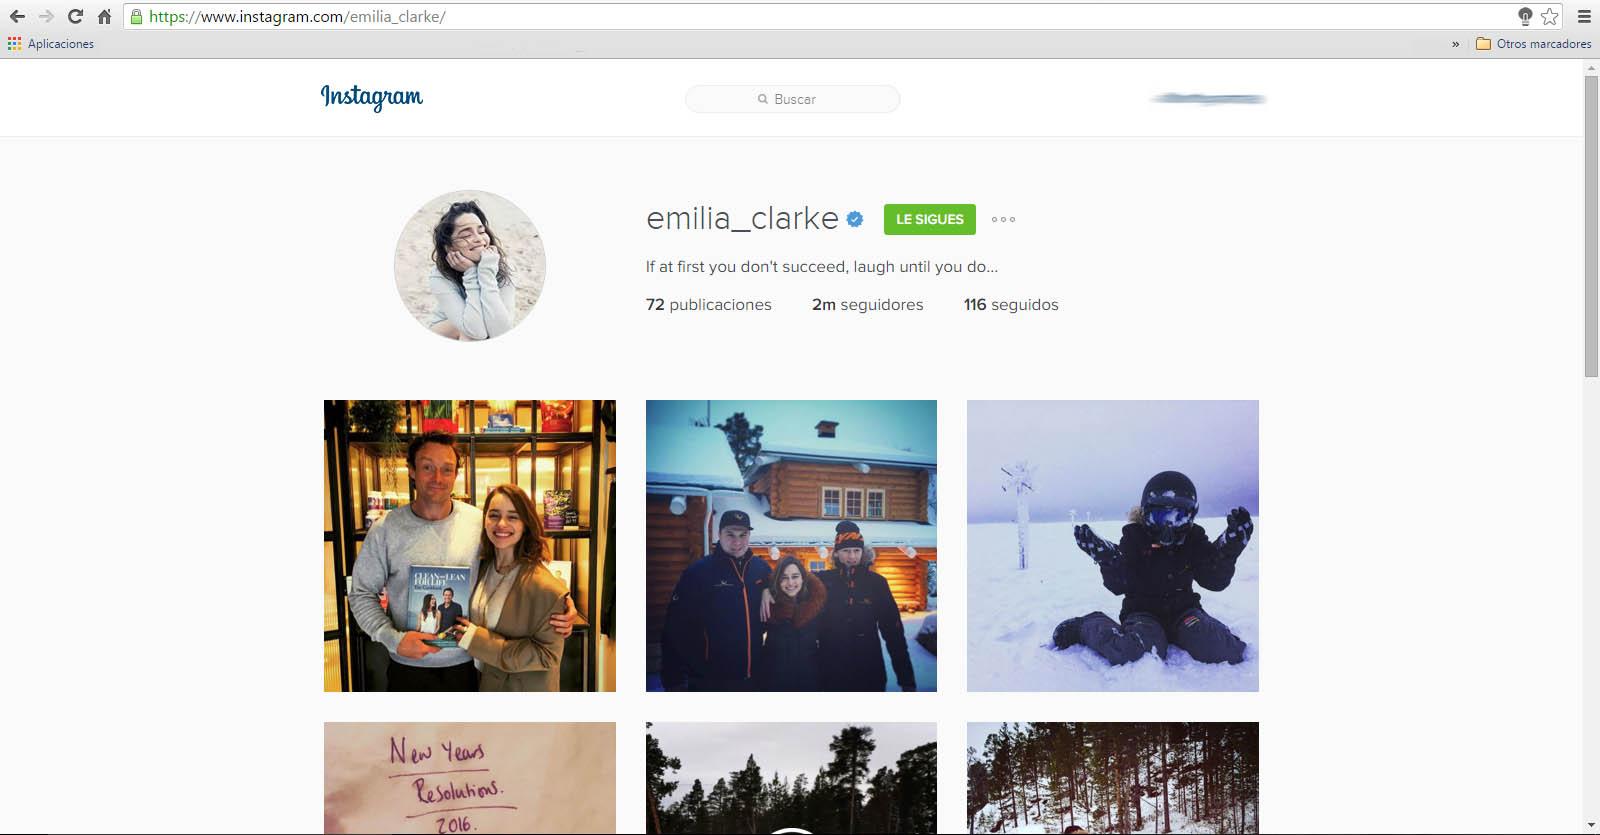 Instagram web emilia clarke2